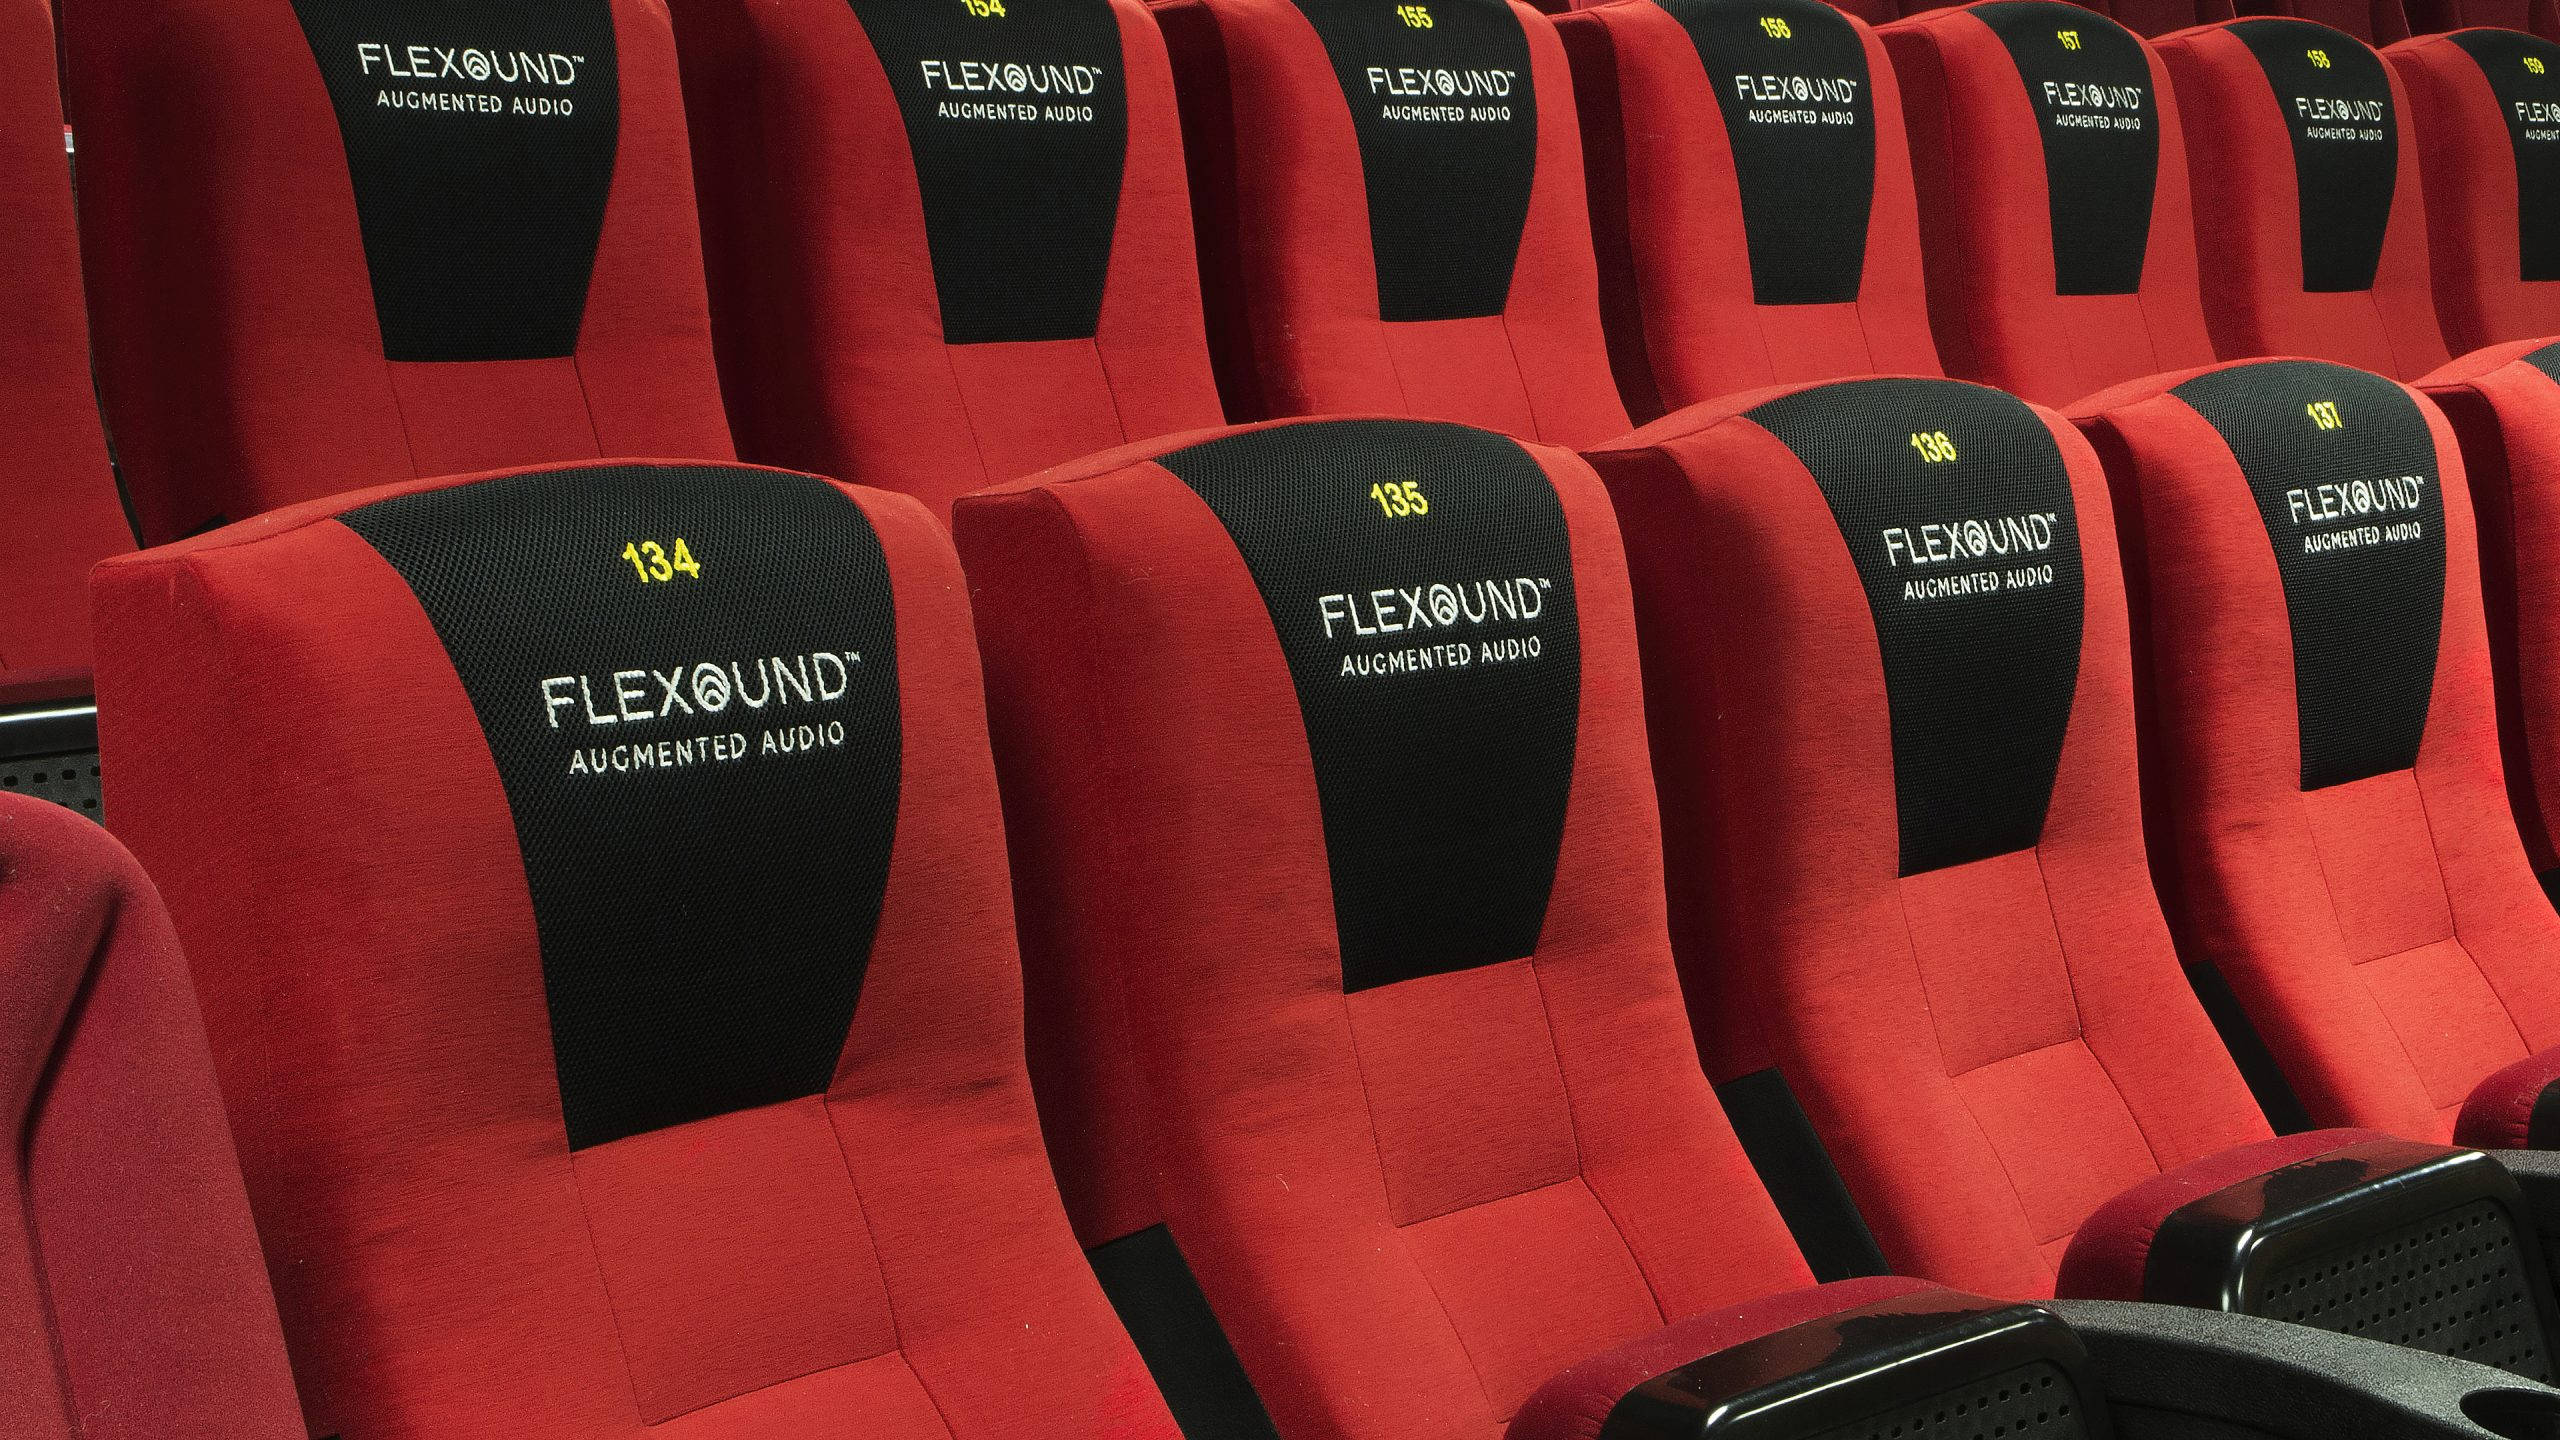 flexound-augmented-audio-cinema-seats